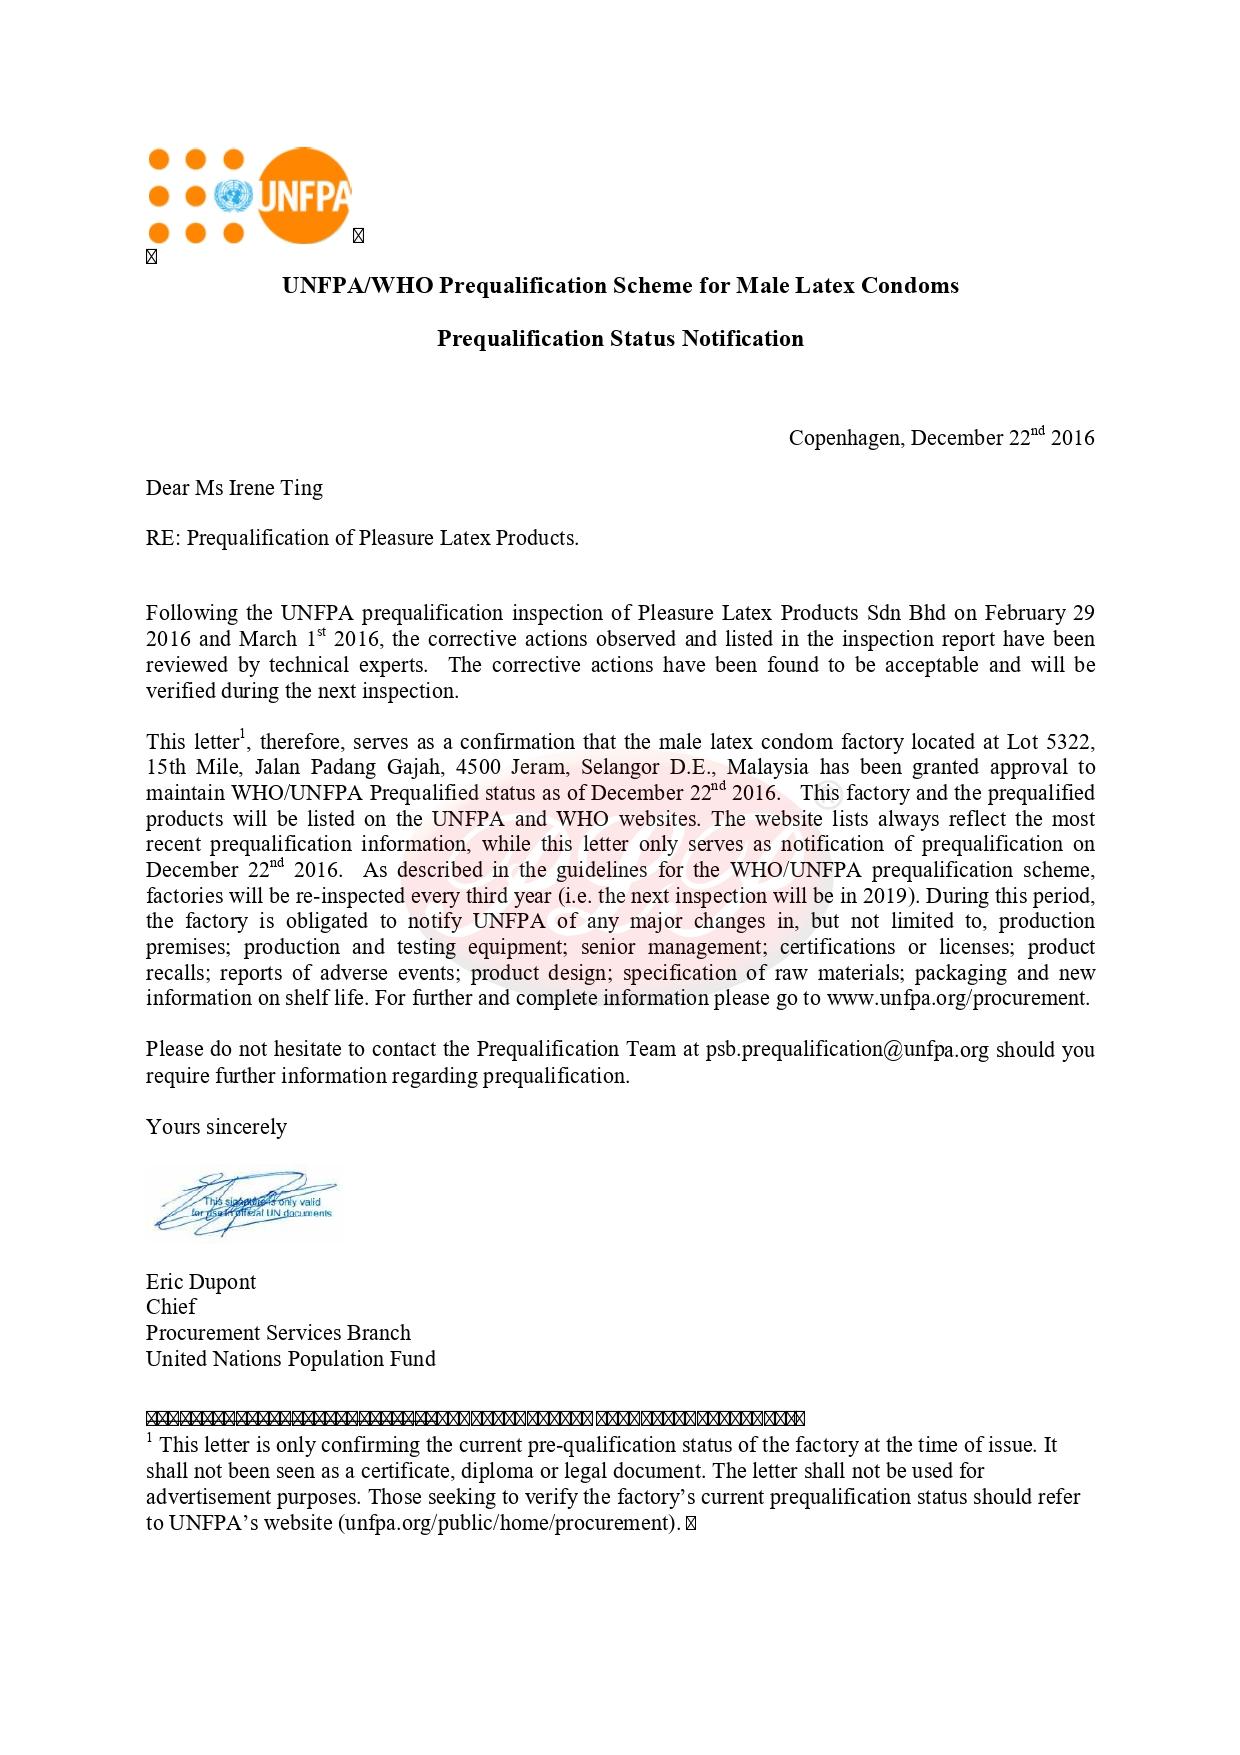 Notice of WHO_UNFPA Prequalification_Pleasure Latex